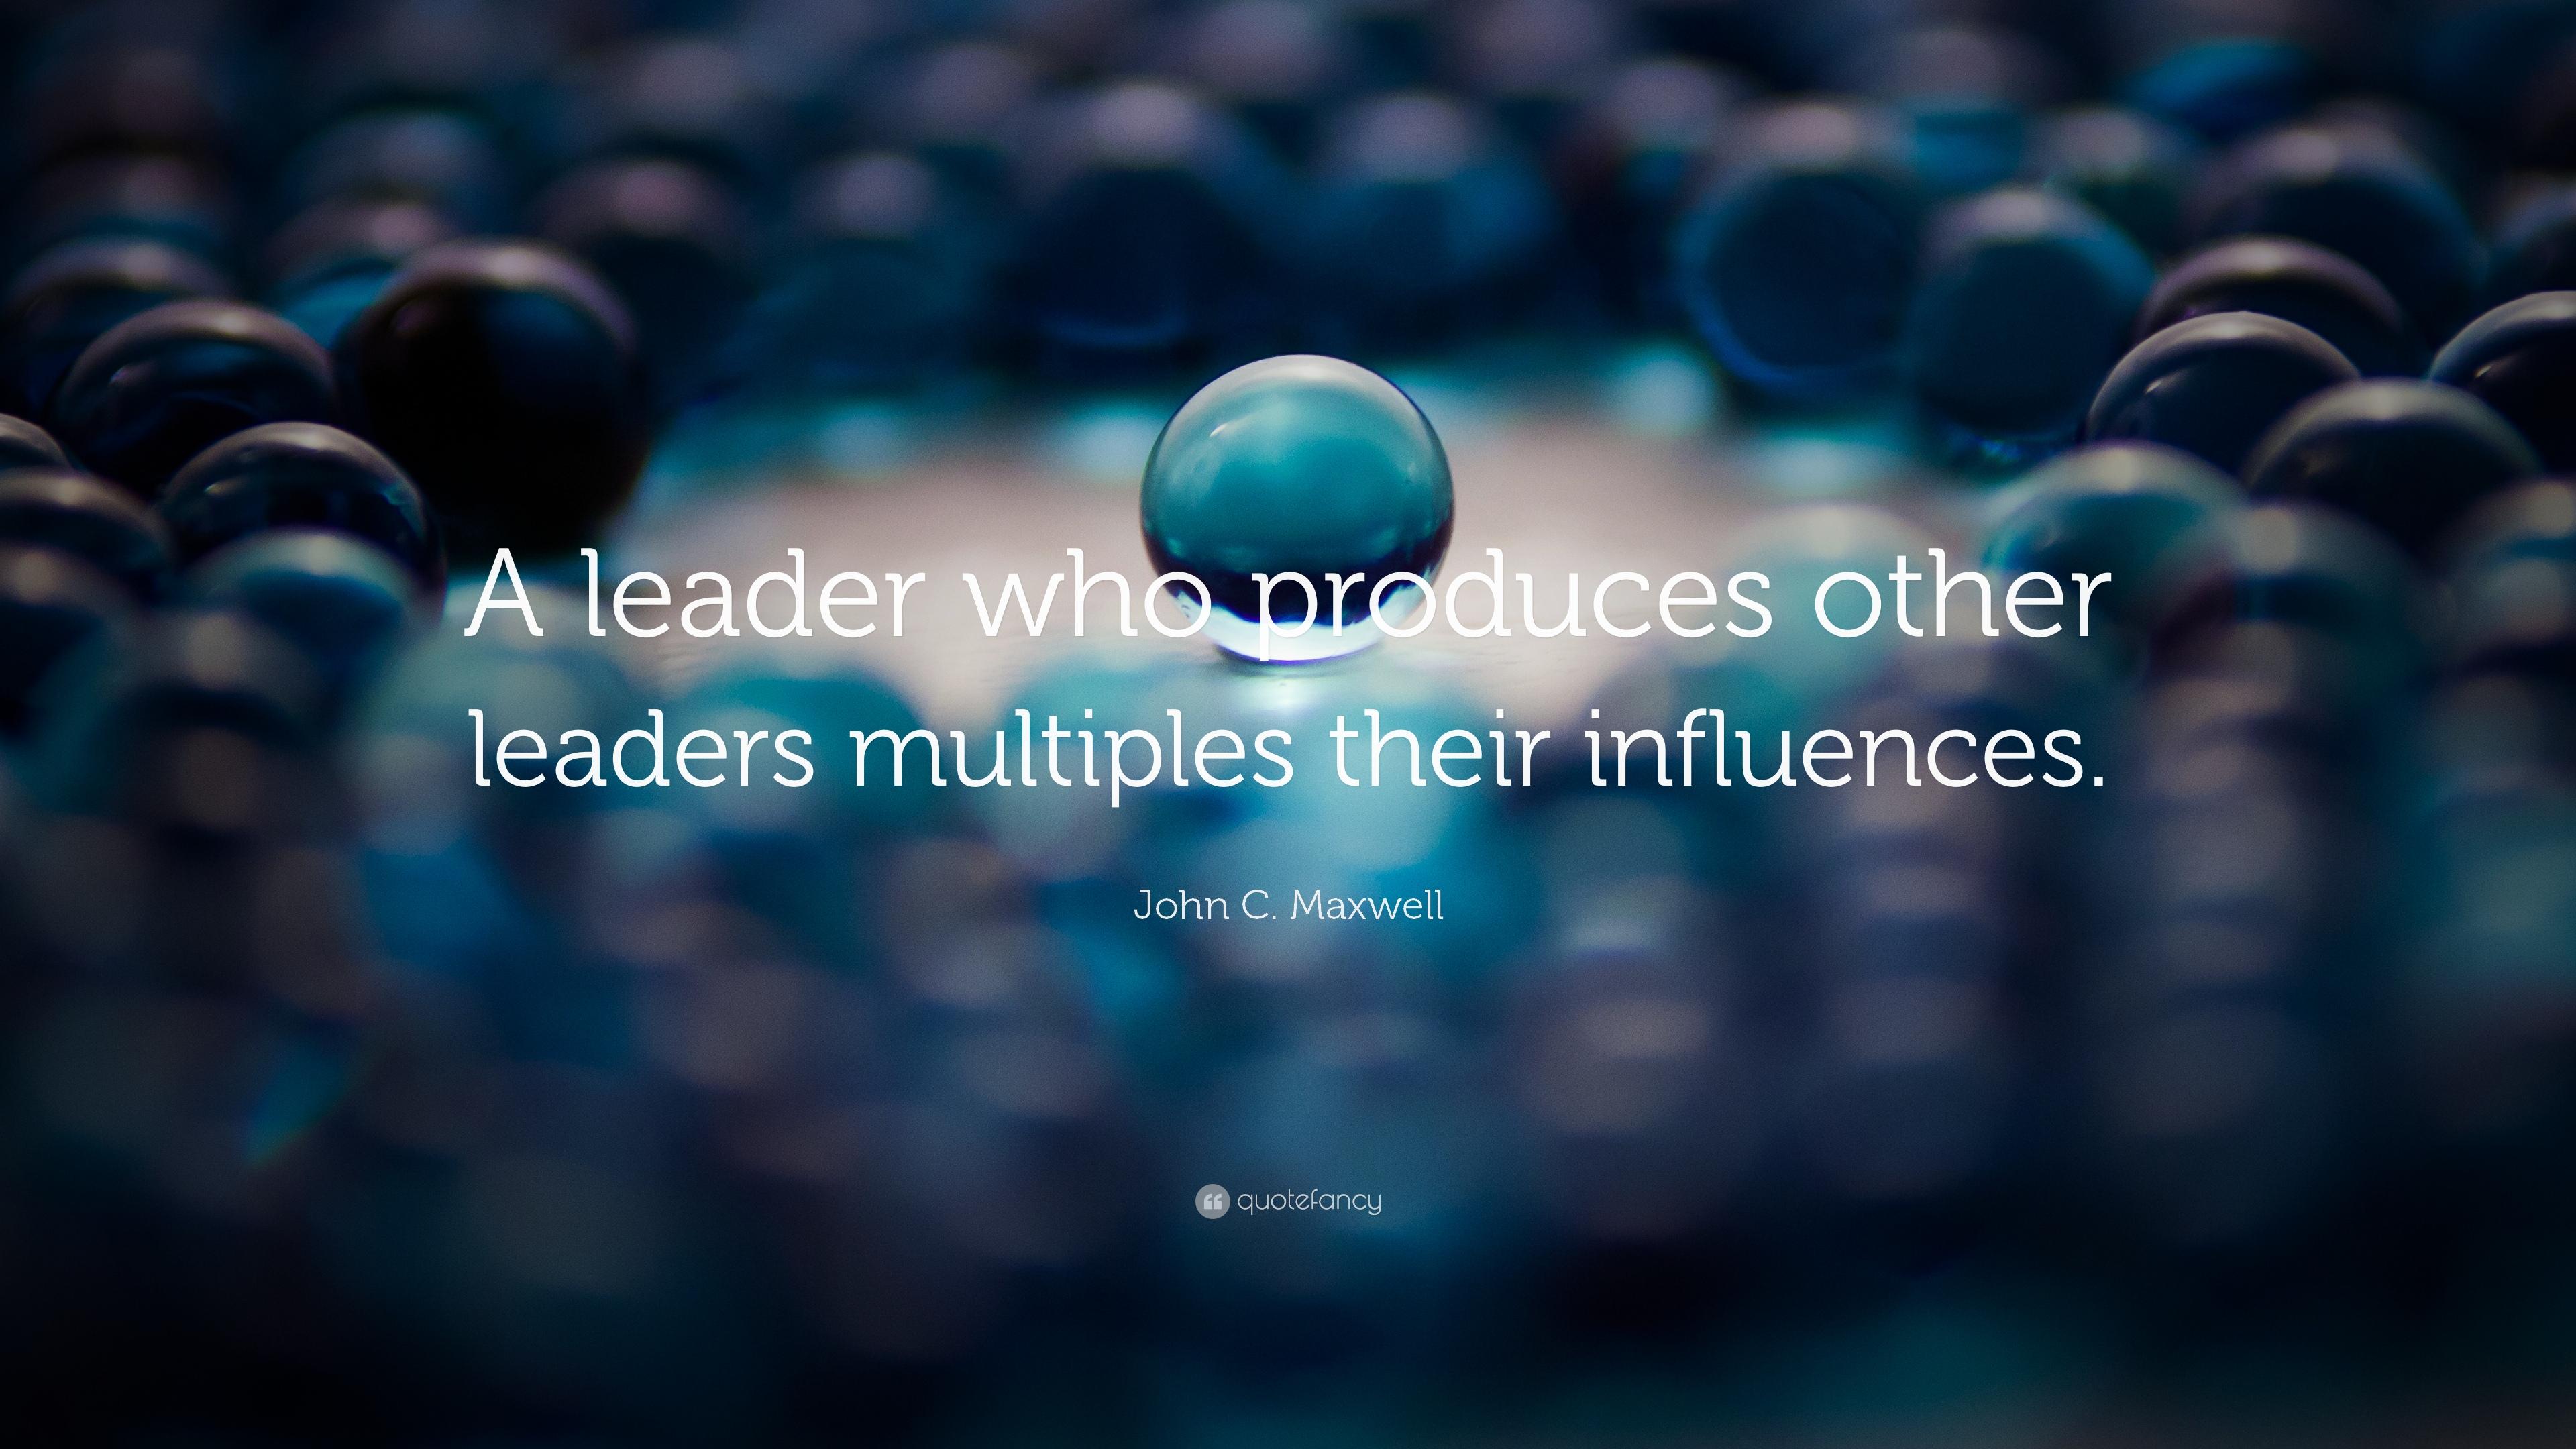 Leadership Wallpaper wwwpixsharkcom   Images Galleries 3840x2160